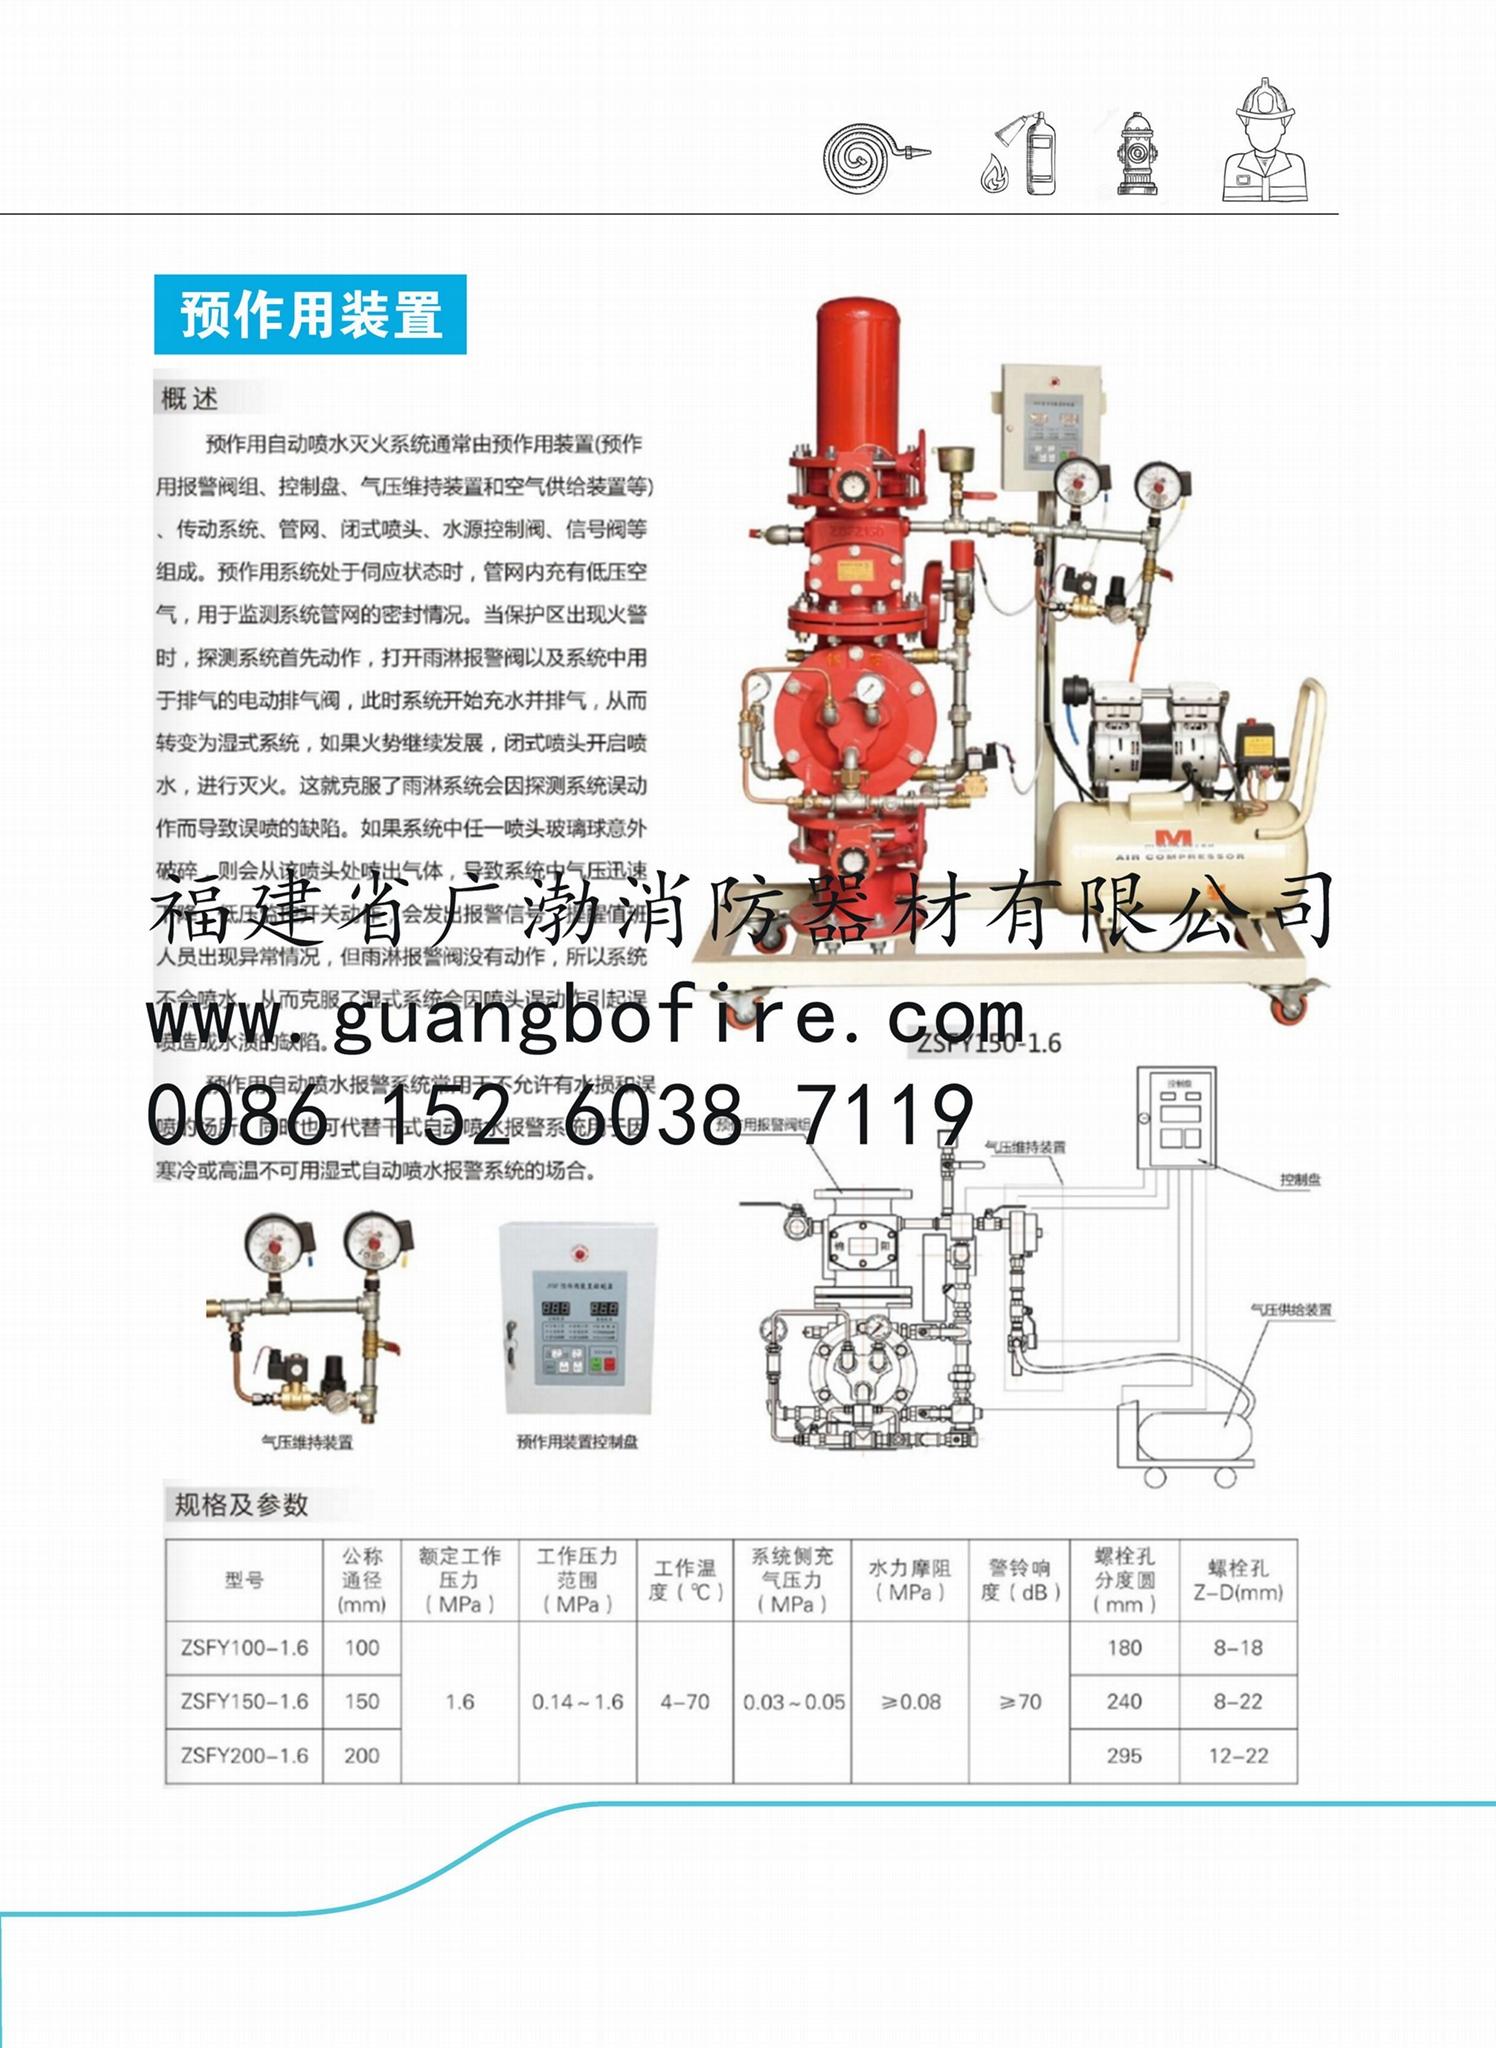 Fire Pump Adapter Saddle Type Water Flow Indicator Reducing Valve fighting 4